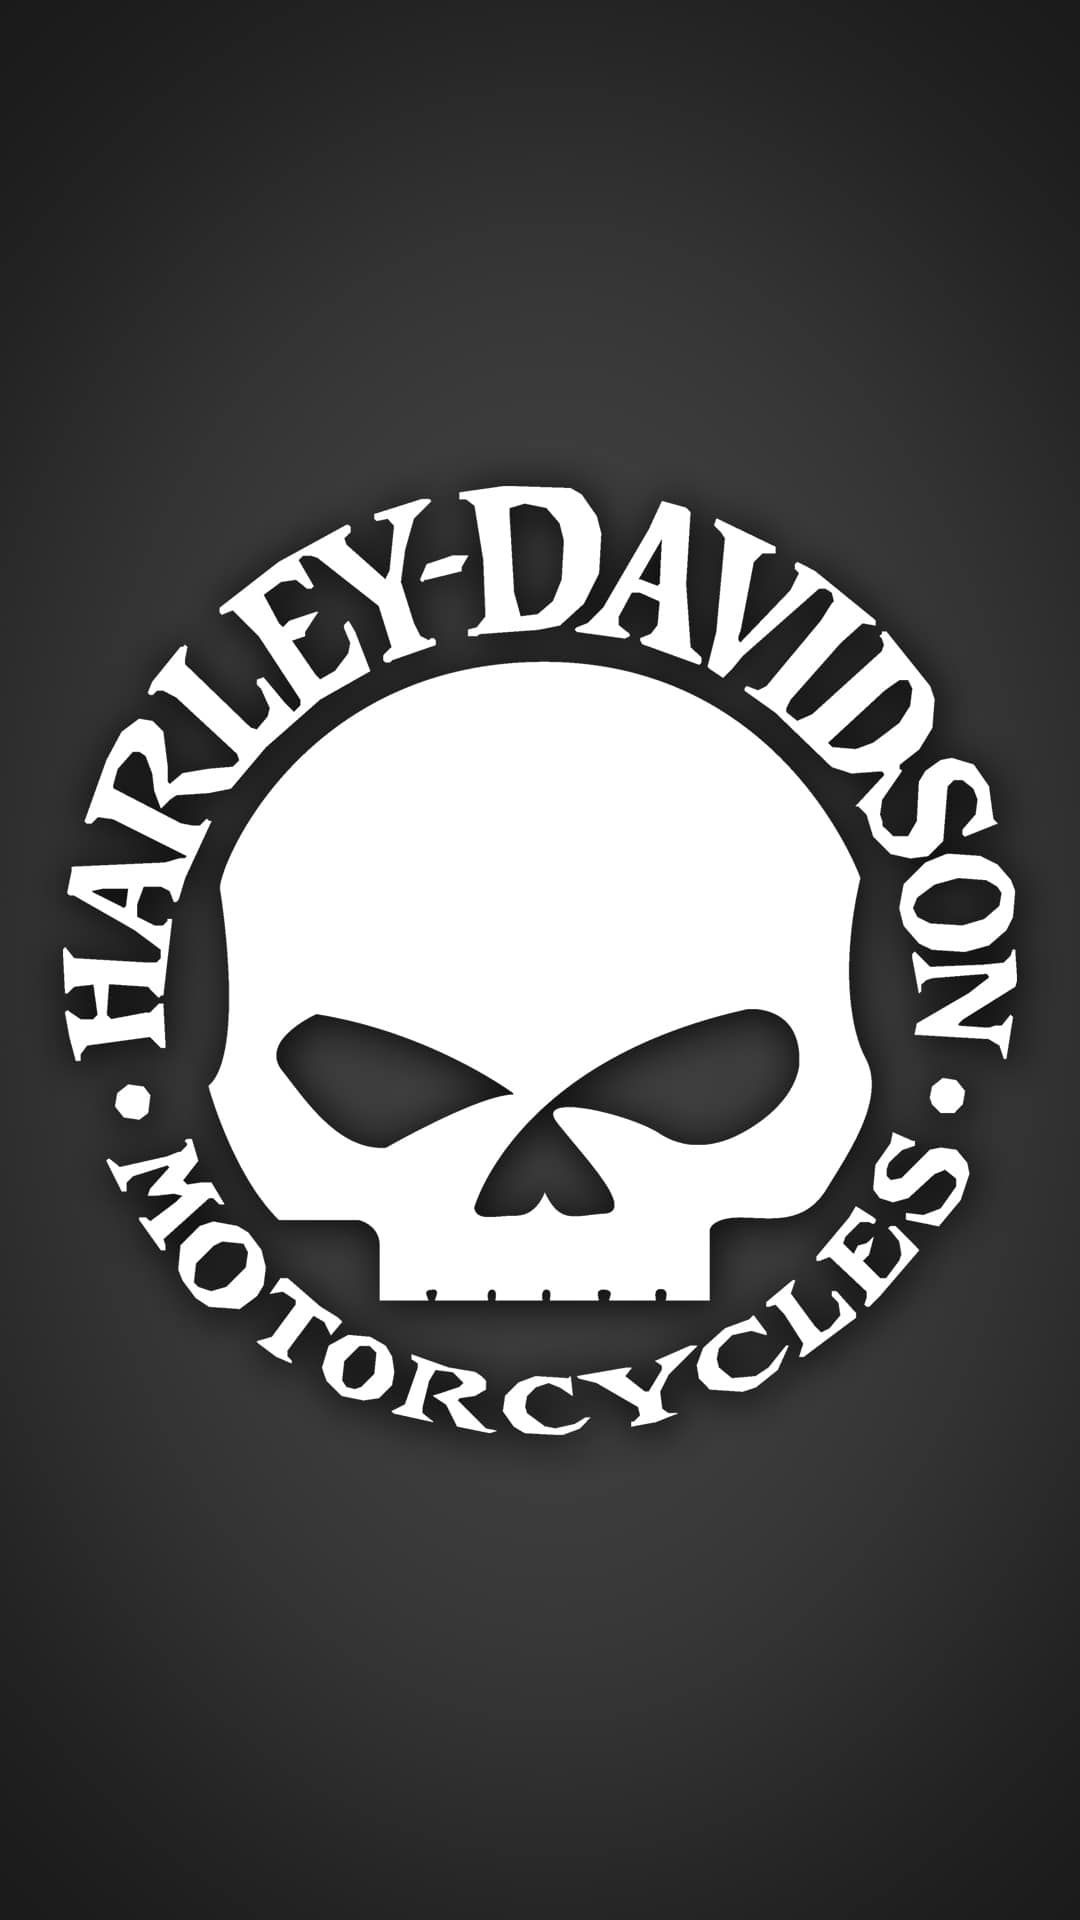 Http Wallpaperformobile Org 14244 Free Harley Davidson Logo Wallpaper Html Free Harley Davidson Harley Davidson Decals Harley Davidson Logo Harley Davidson